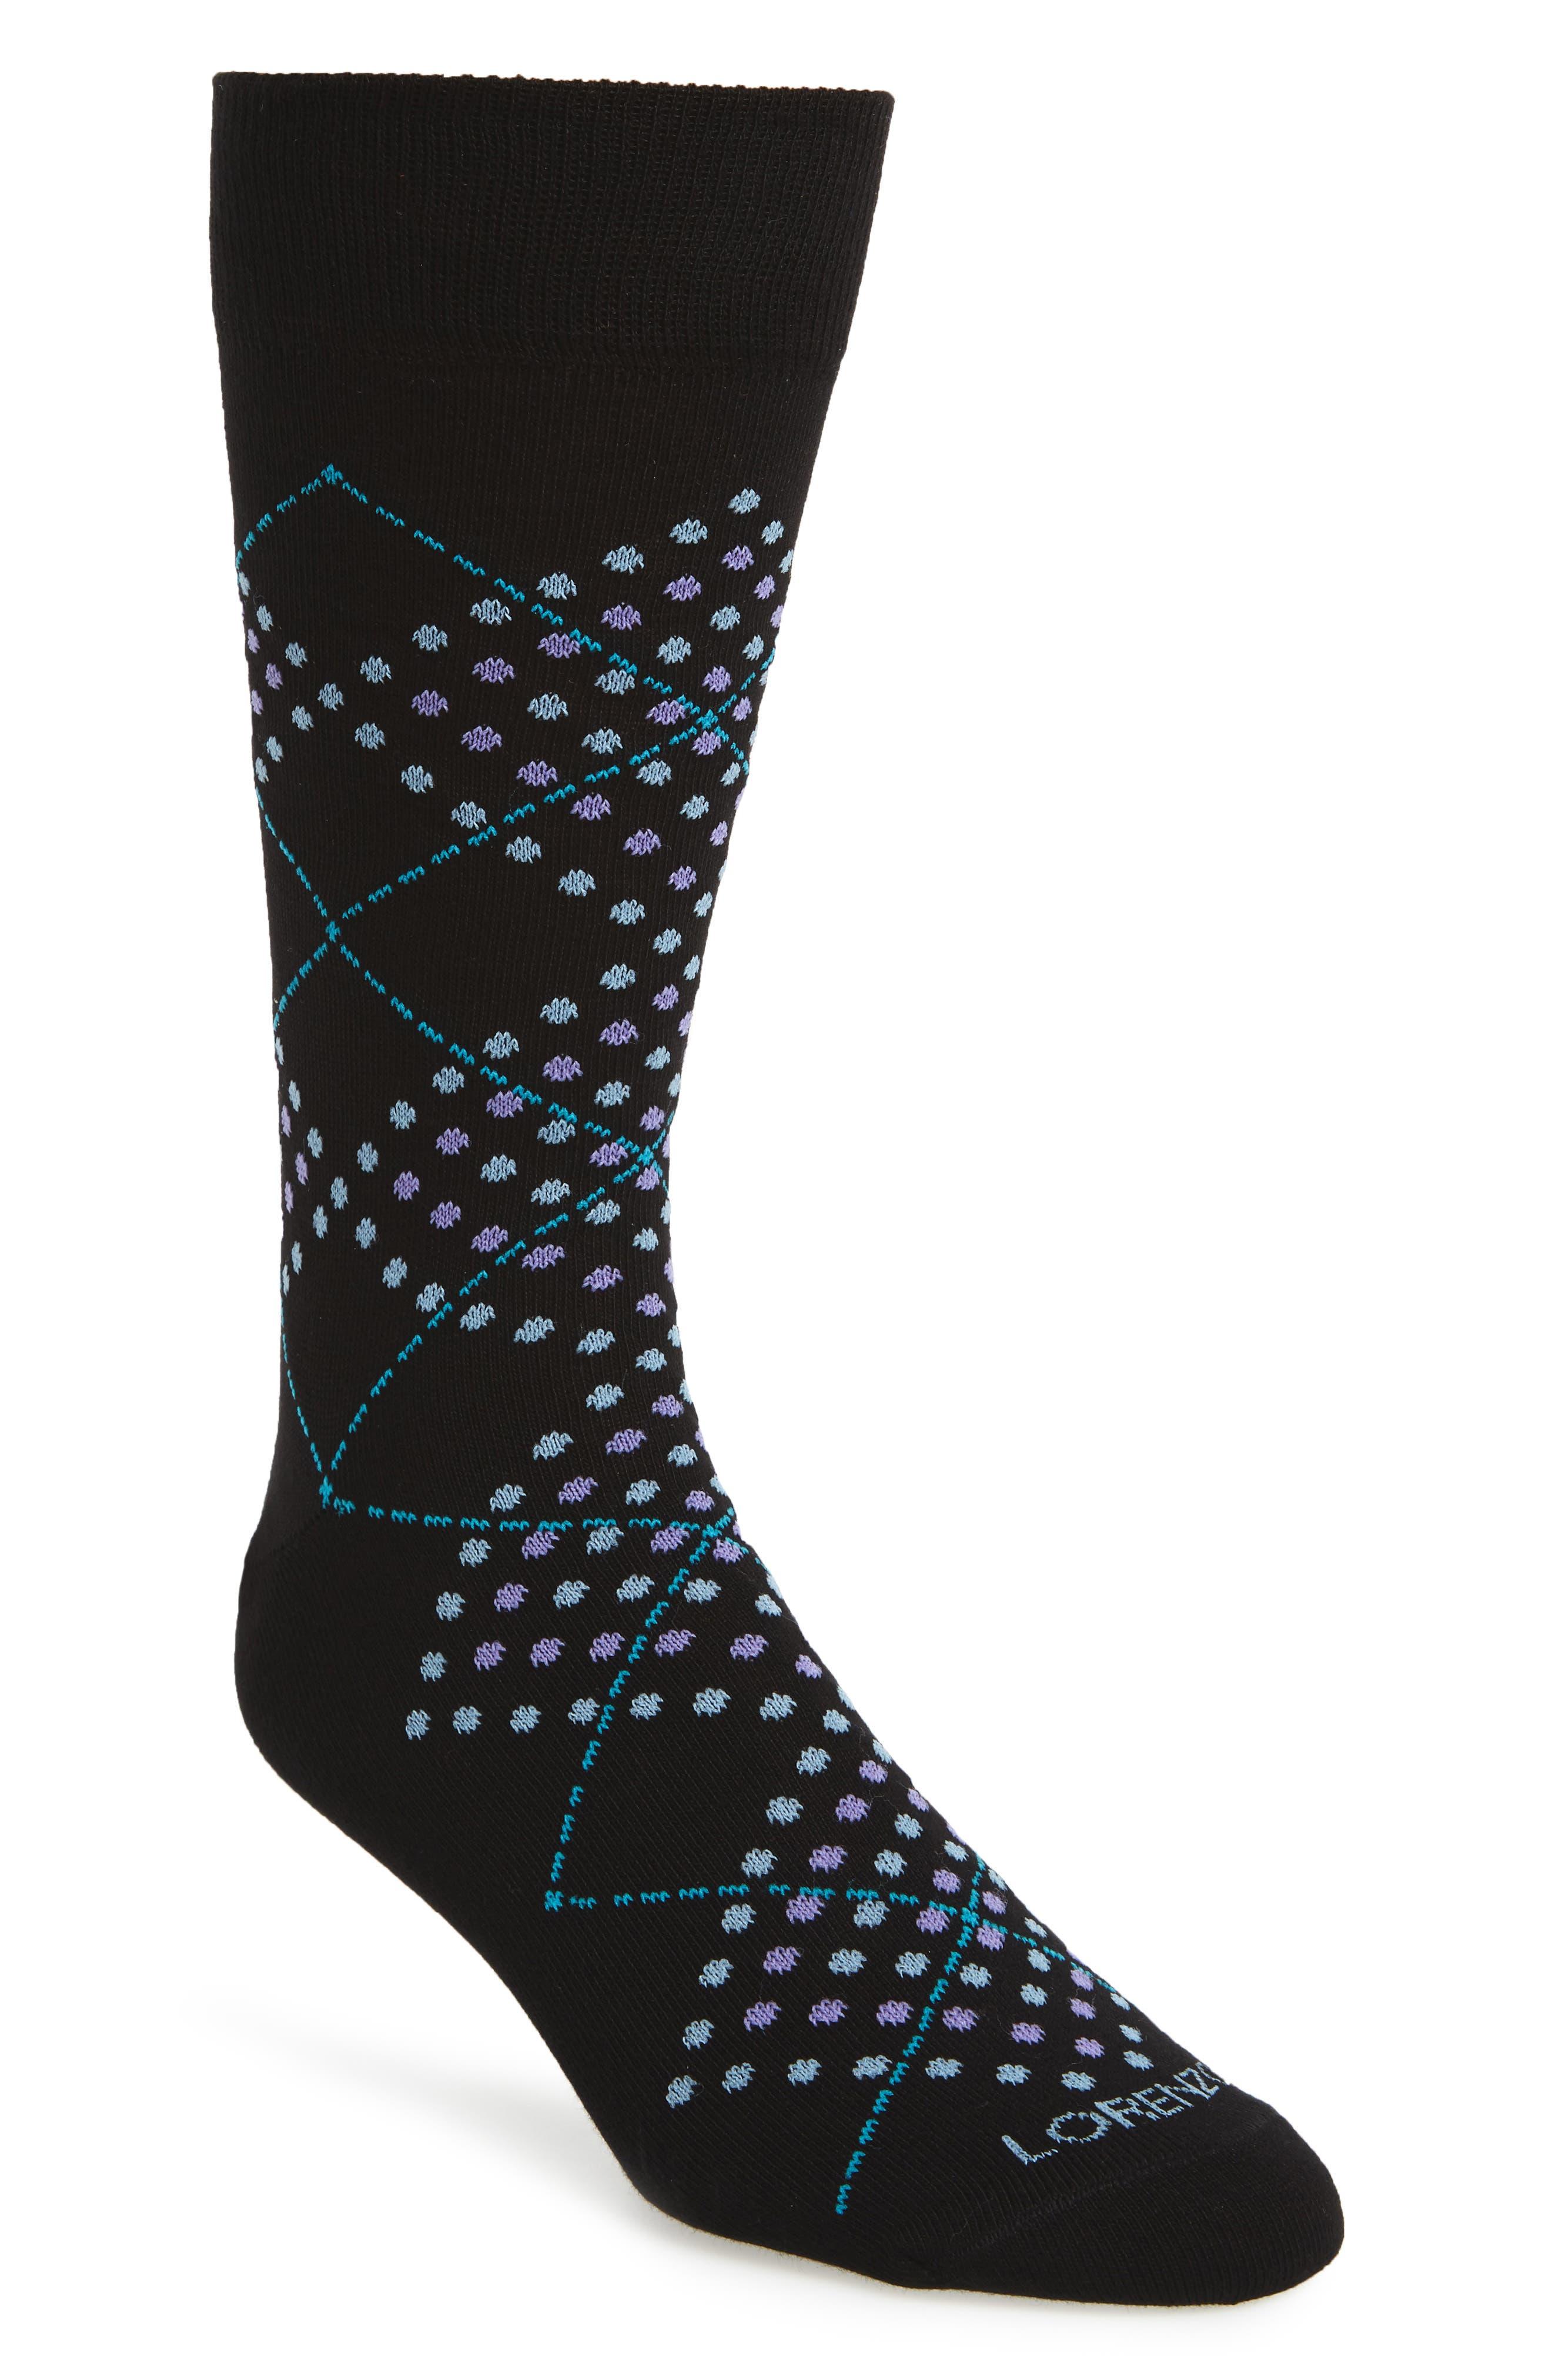 Lorenzo Uomo Dotted Argyle Crew Socks